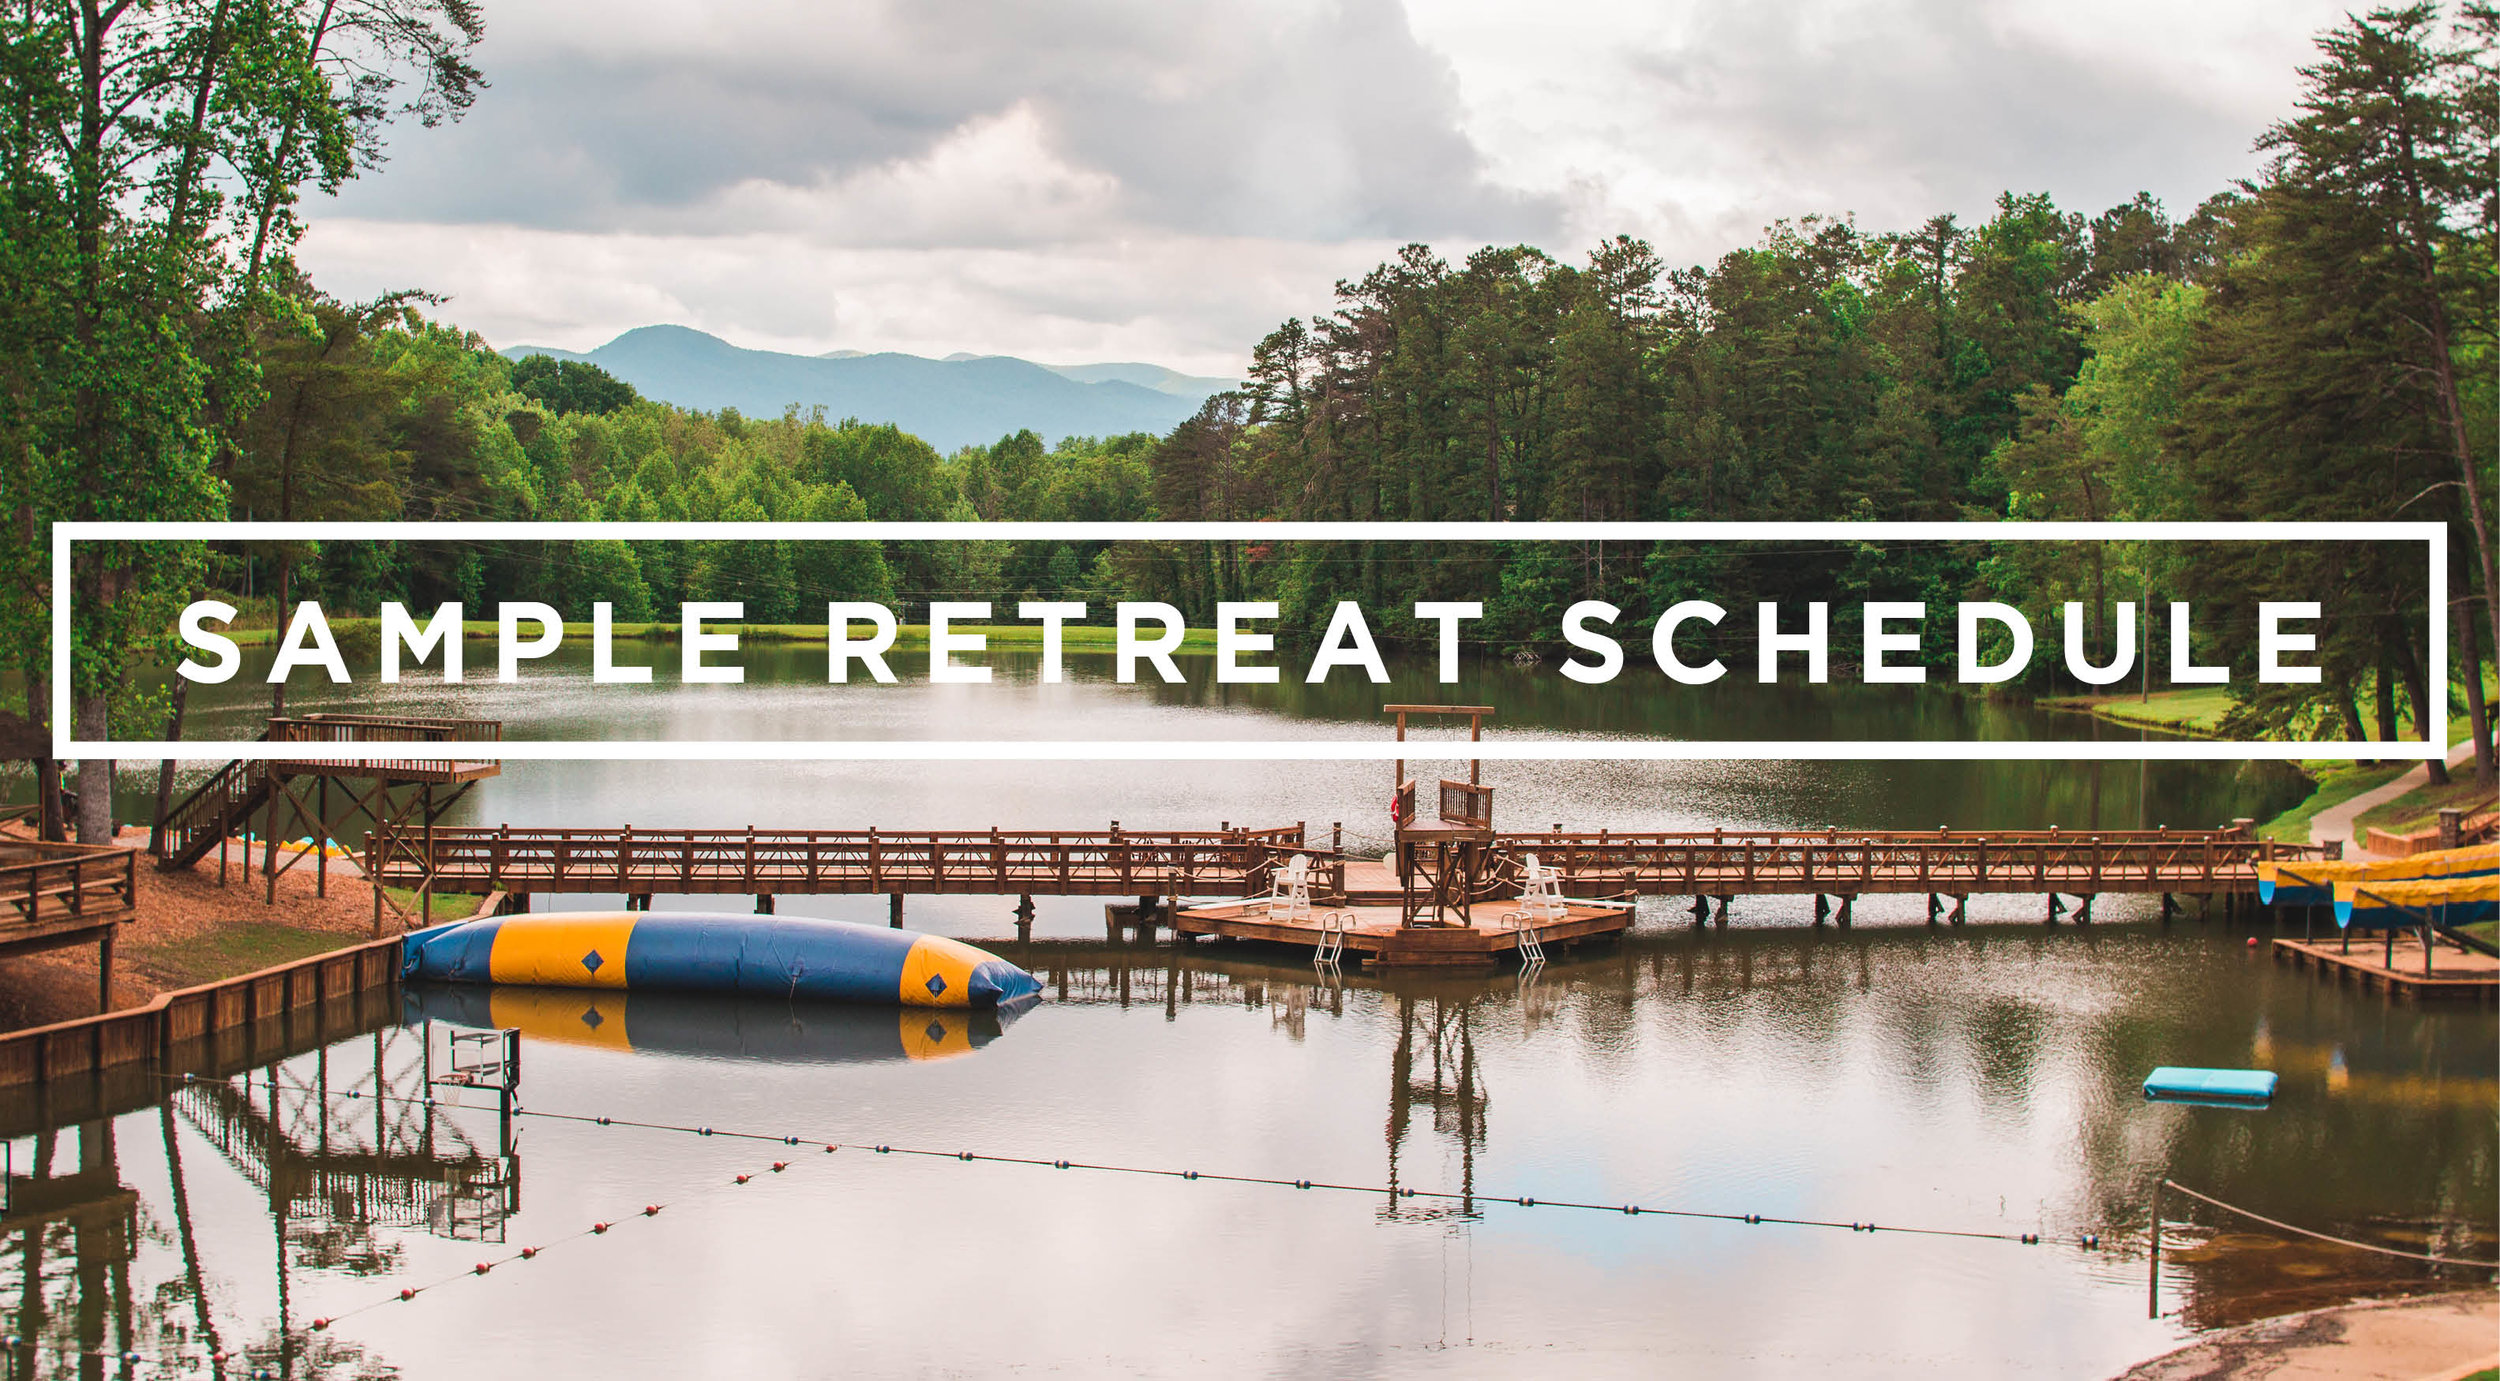 sample retreat schedule.jpg